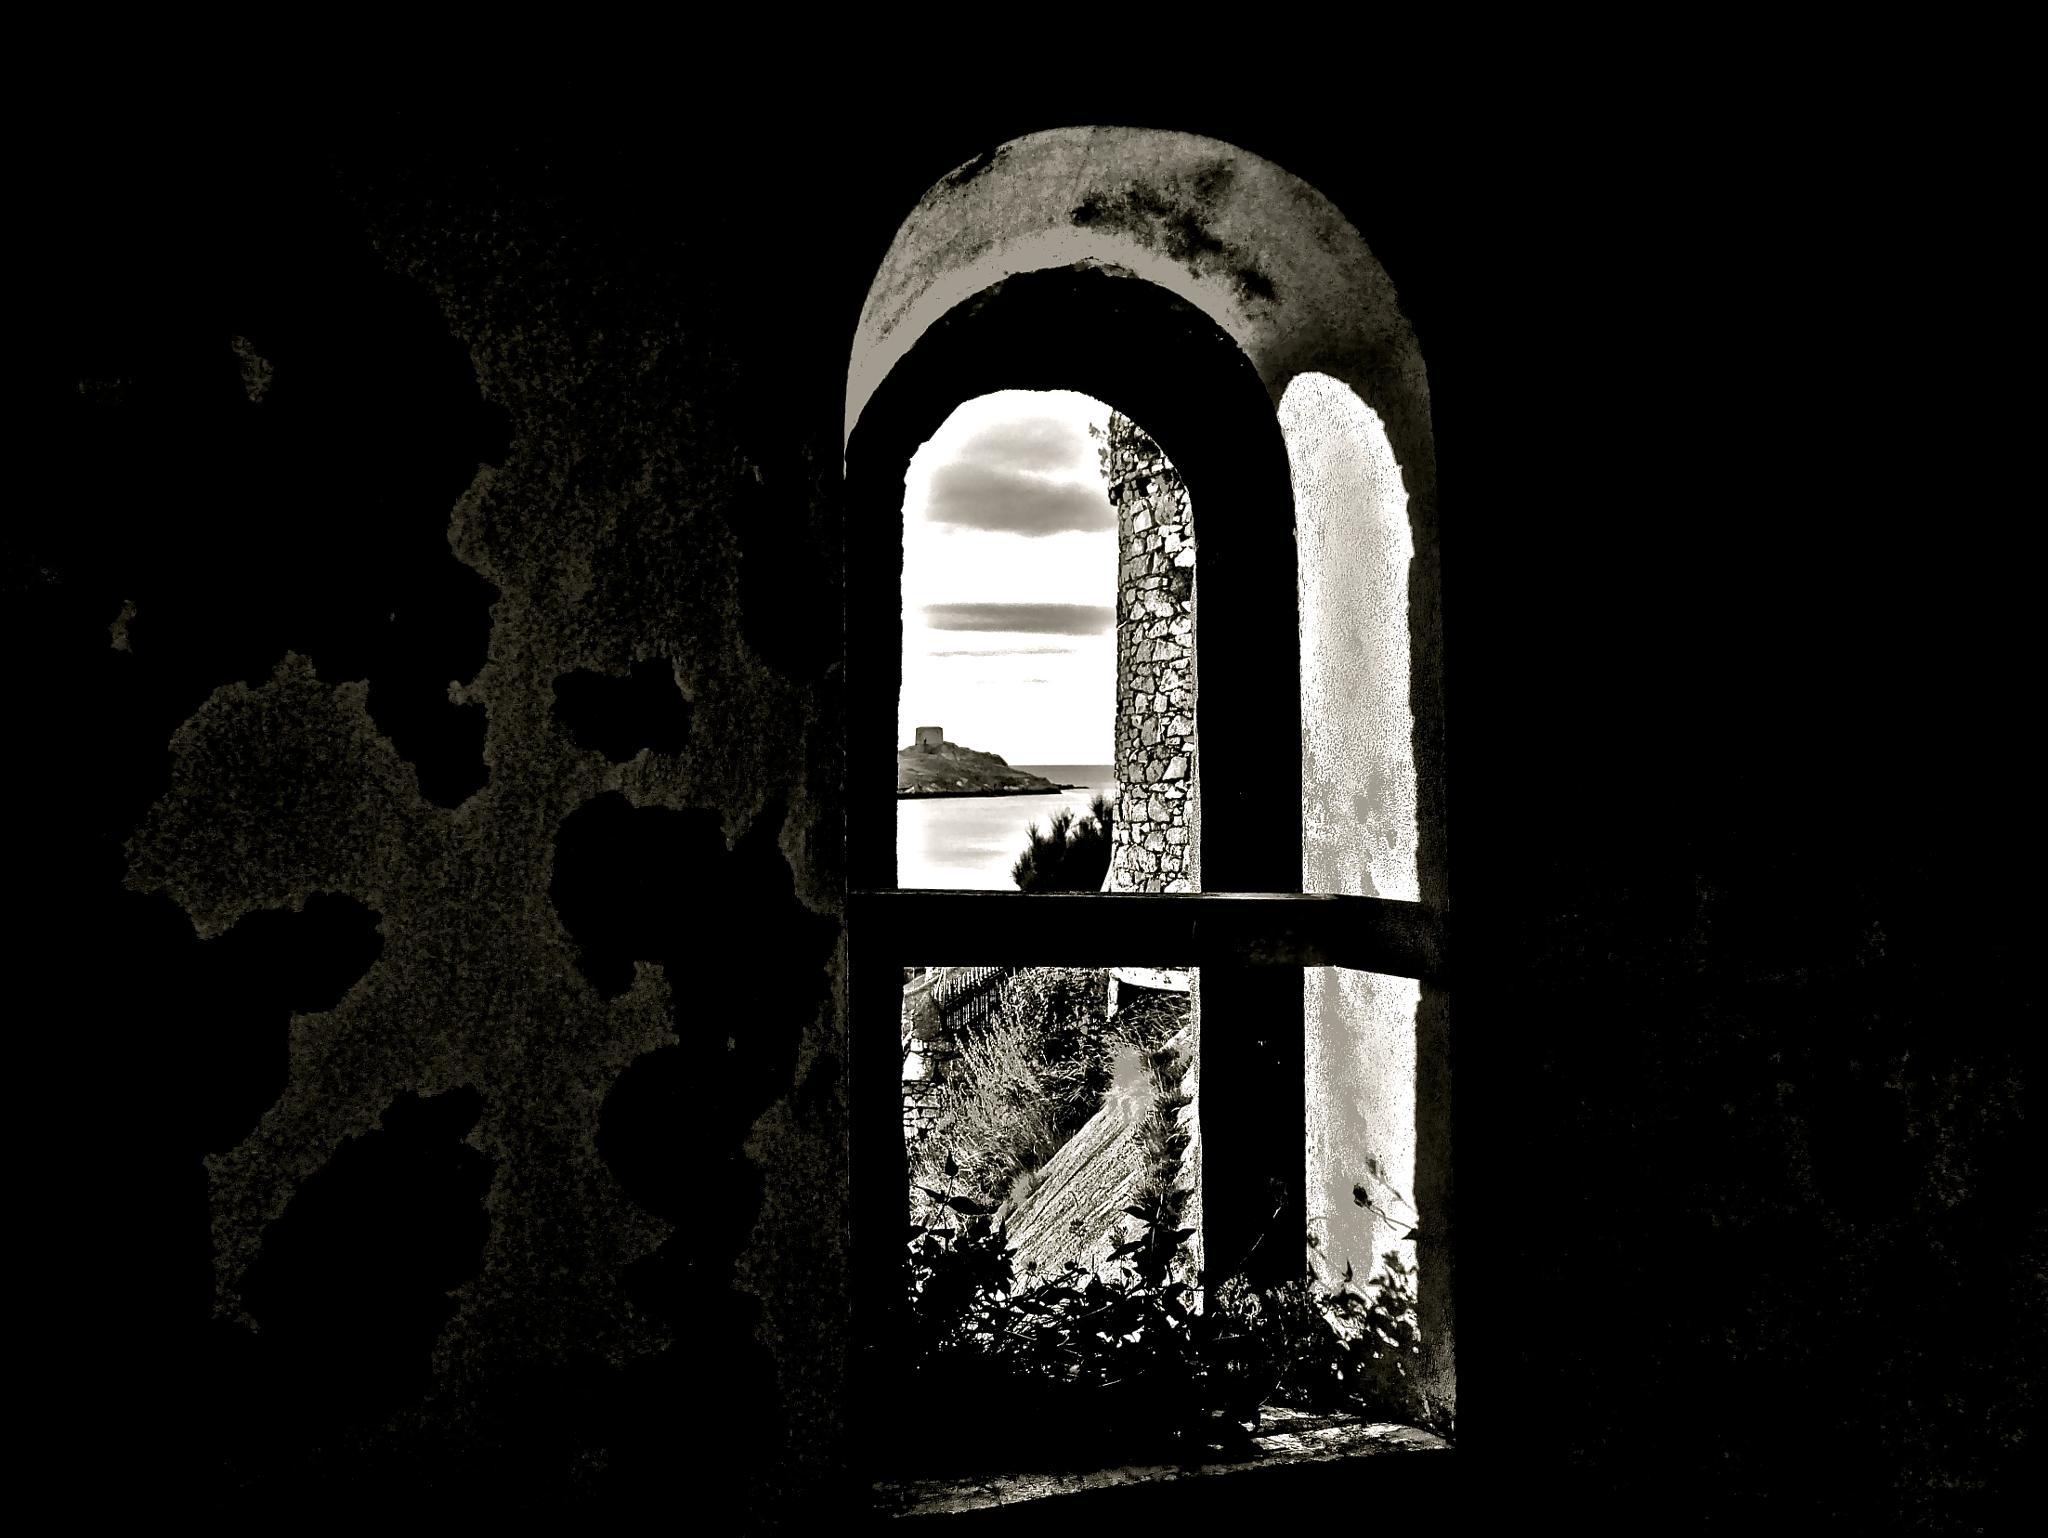 martello tower through window by Desmond O'connor photography